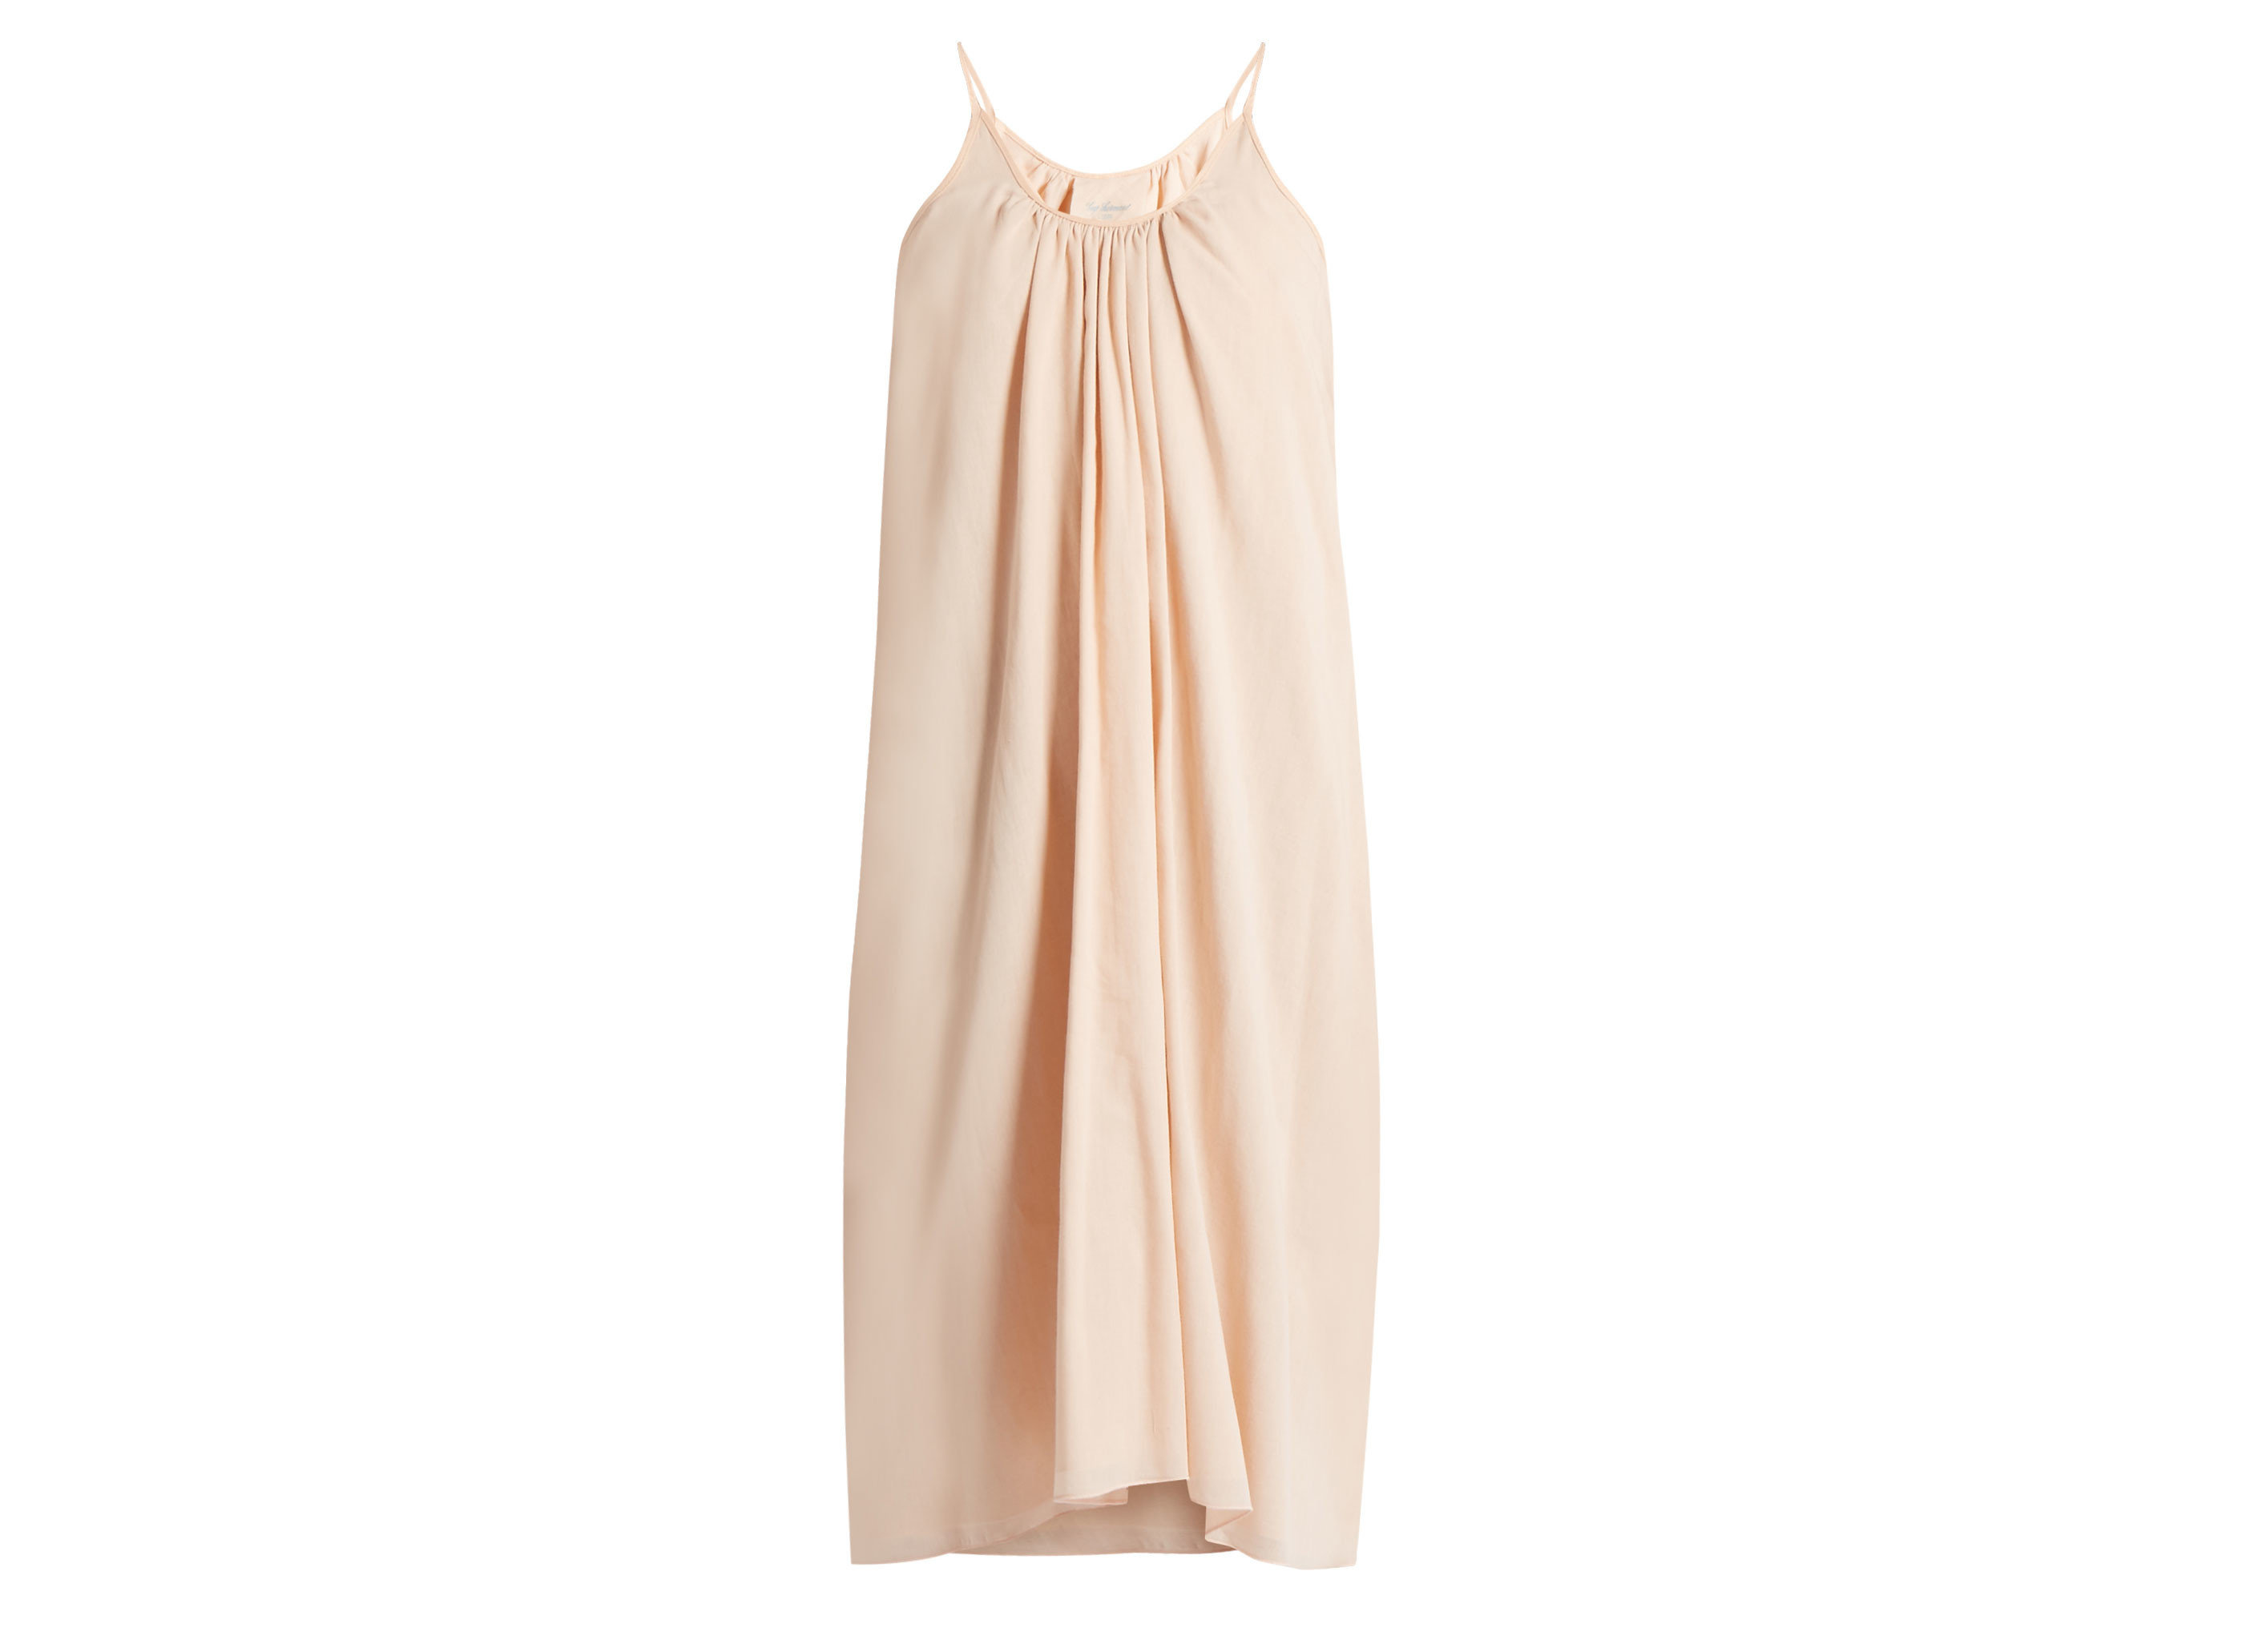 Style + Design Travel Shop clothing day dress dress shoulder neck peach beige cocktail dress one piece garment